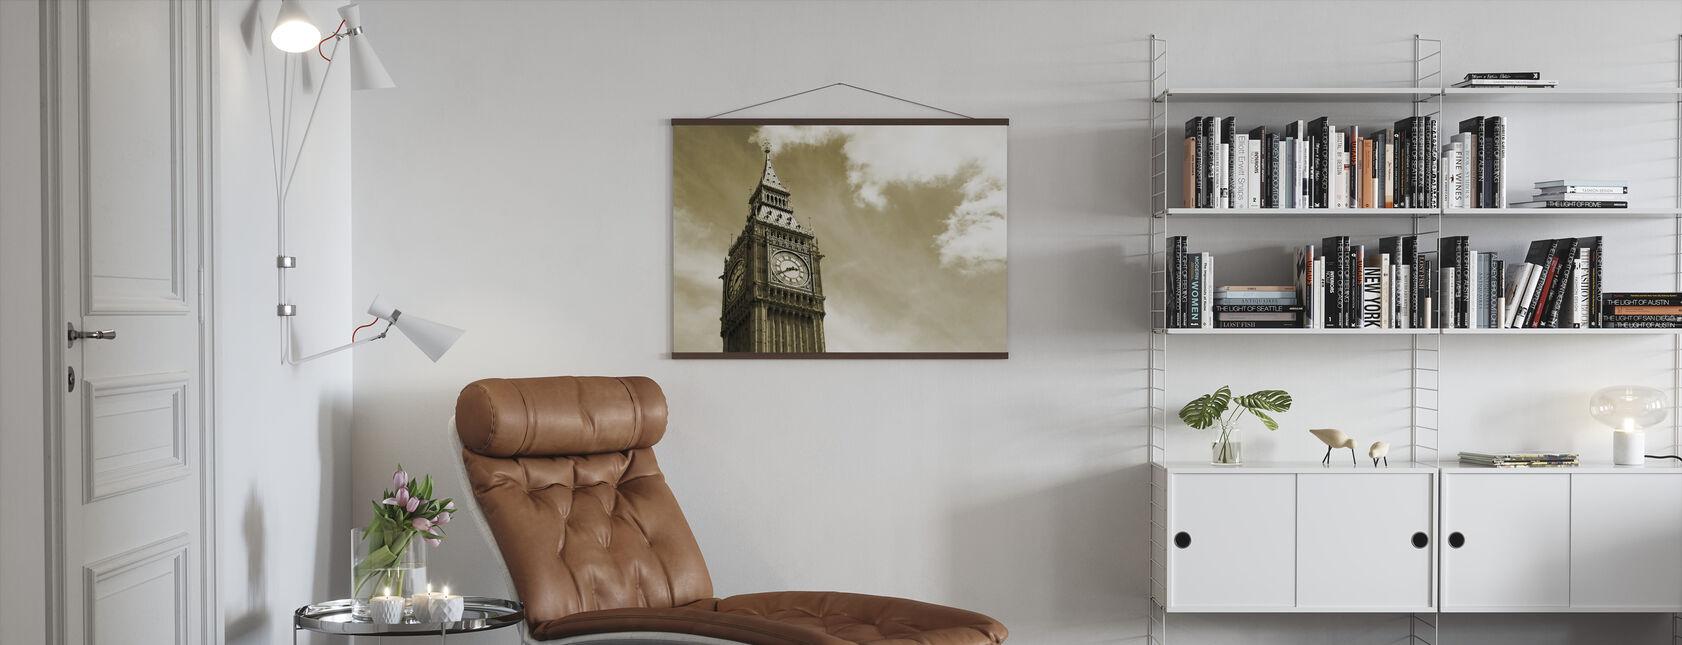 Big Ben, London, UK - Poster - Living Room